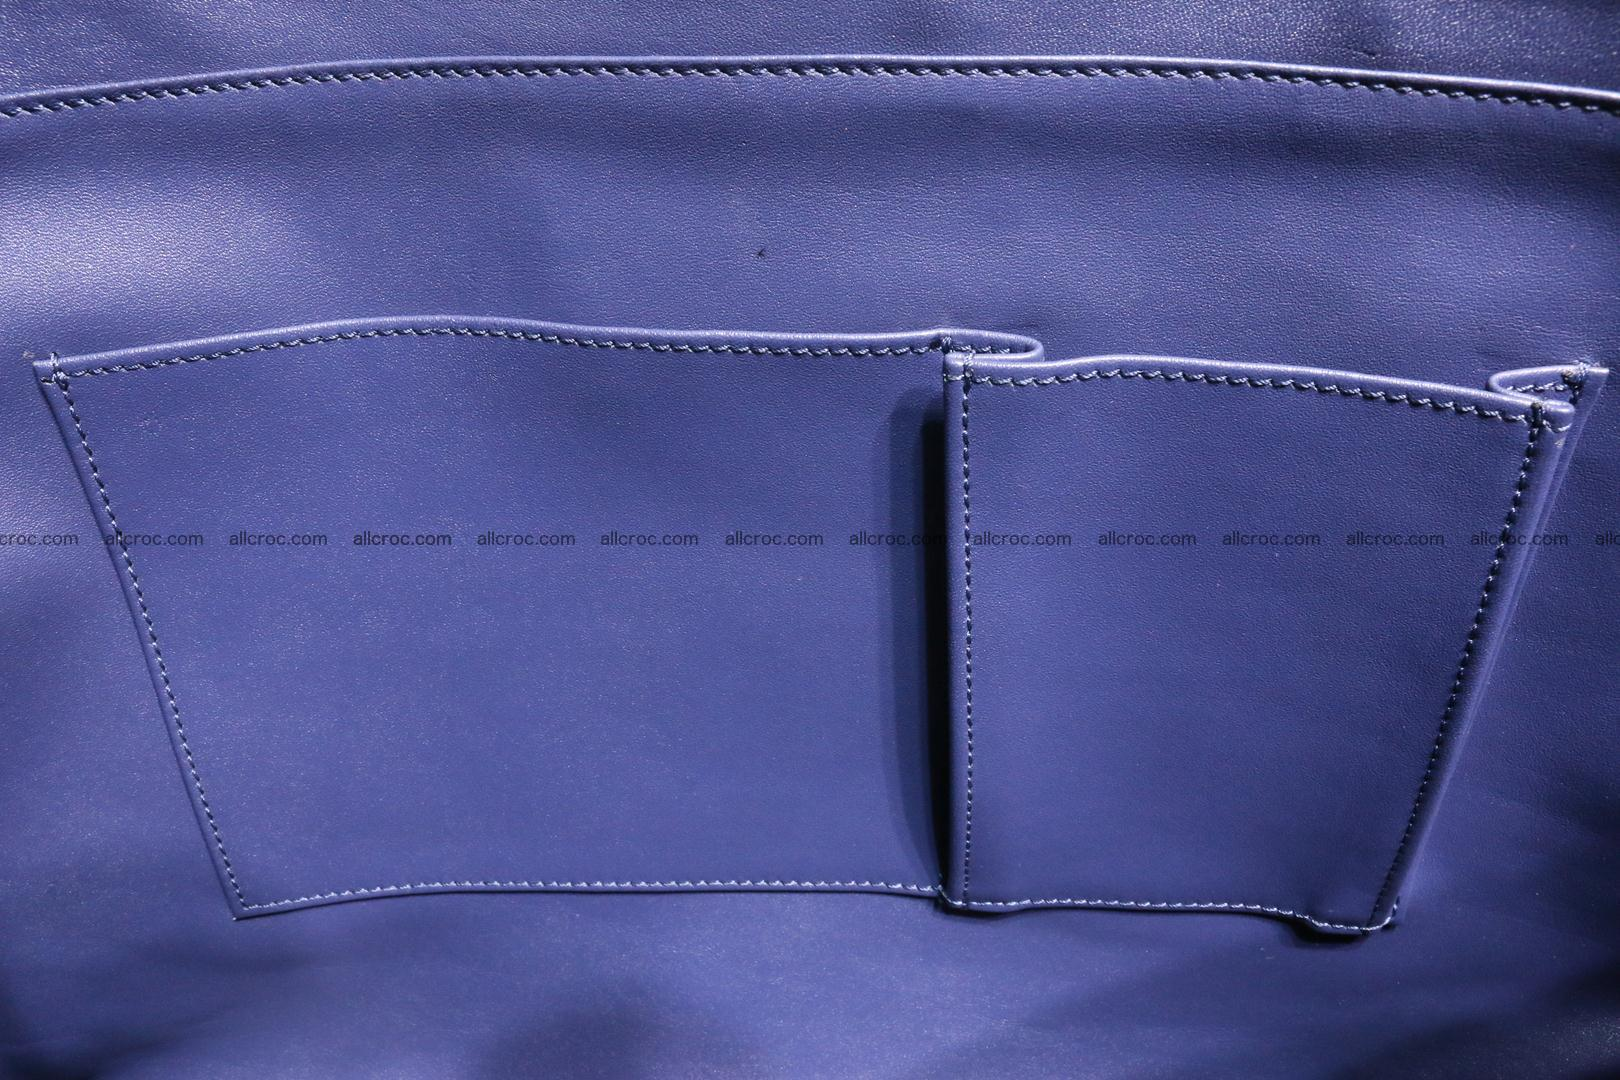 Genuine crocodile leather women's bag 065 Foto 14